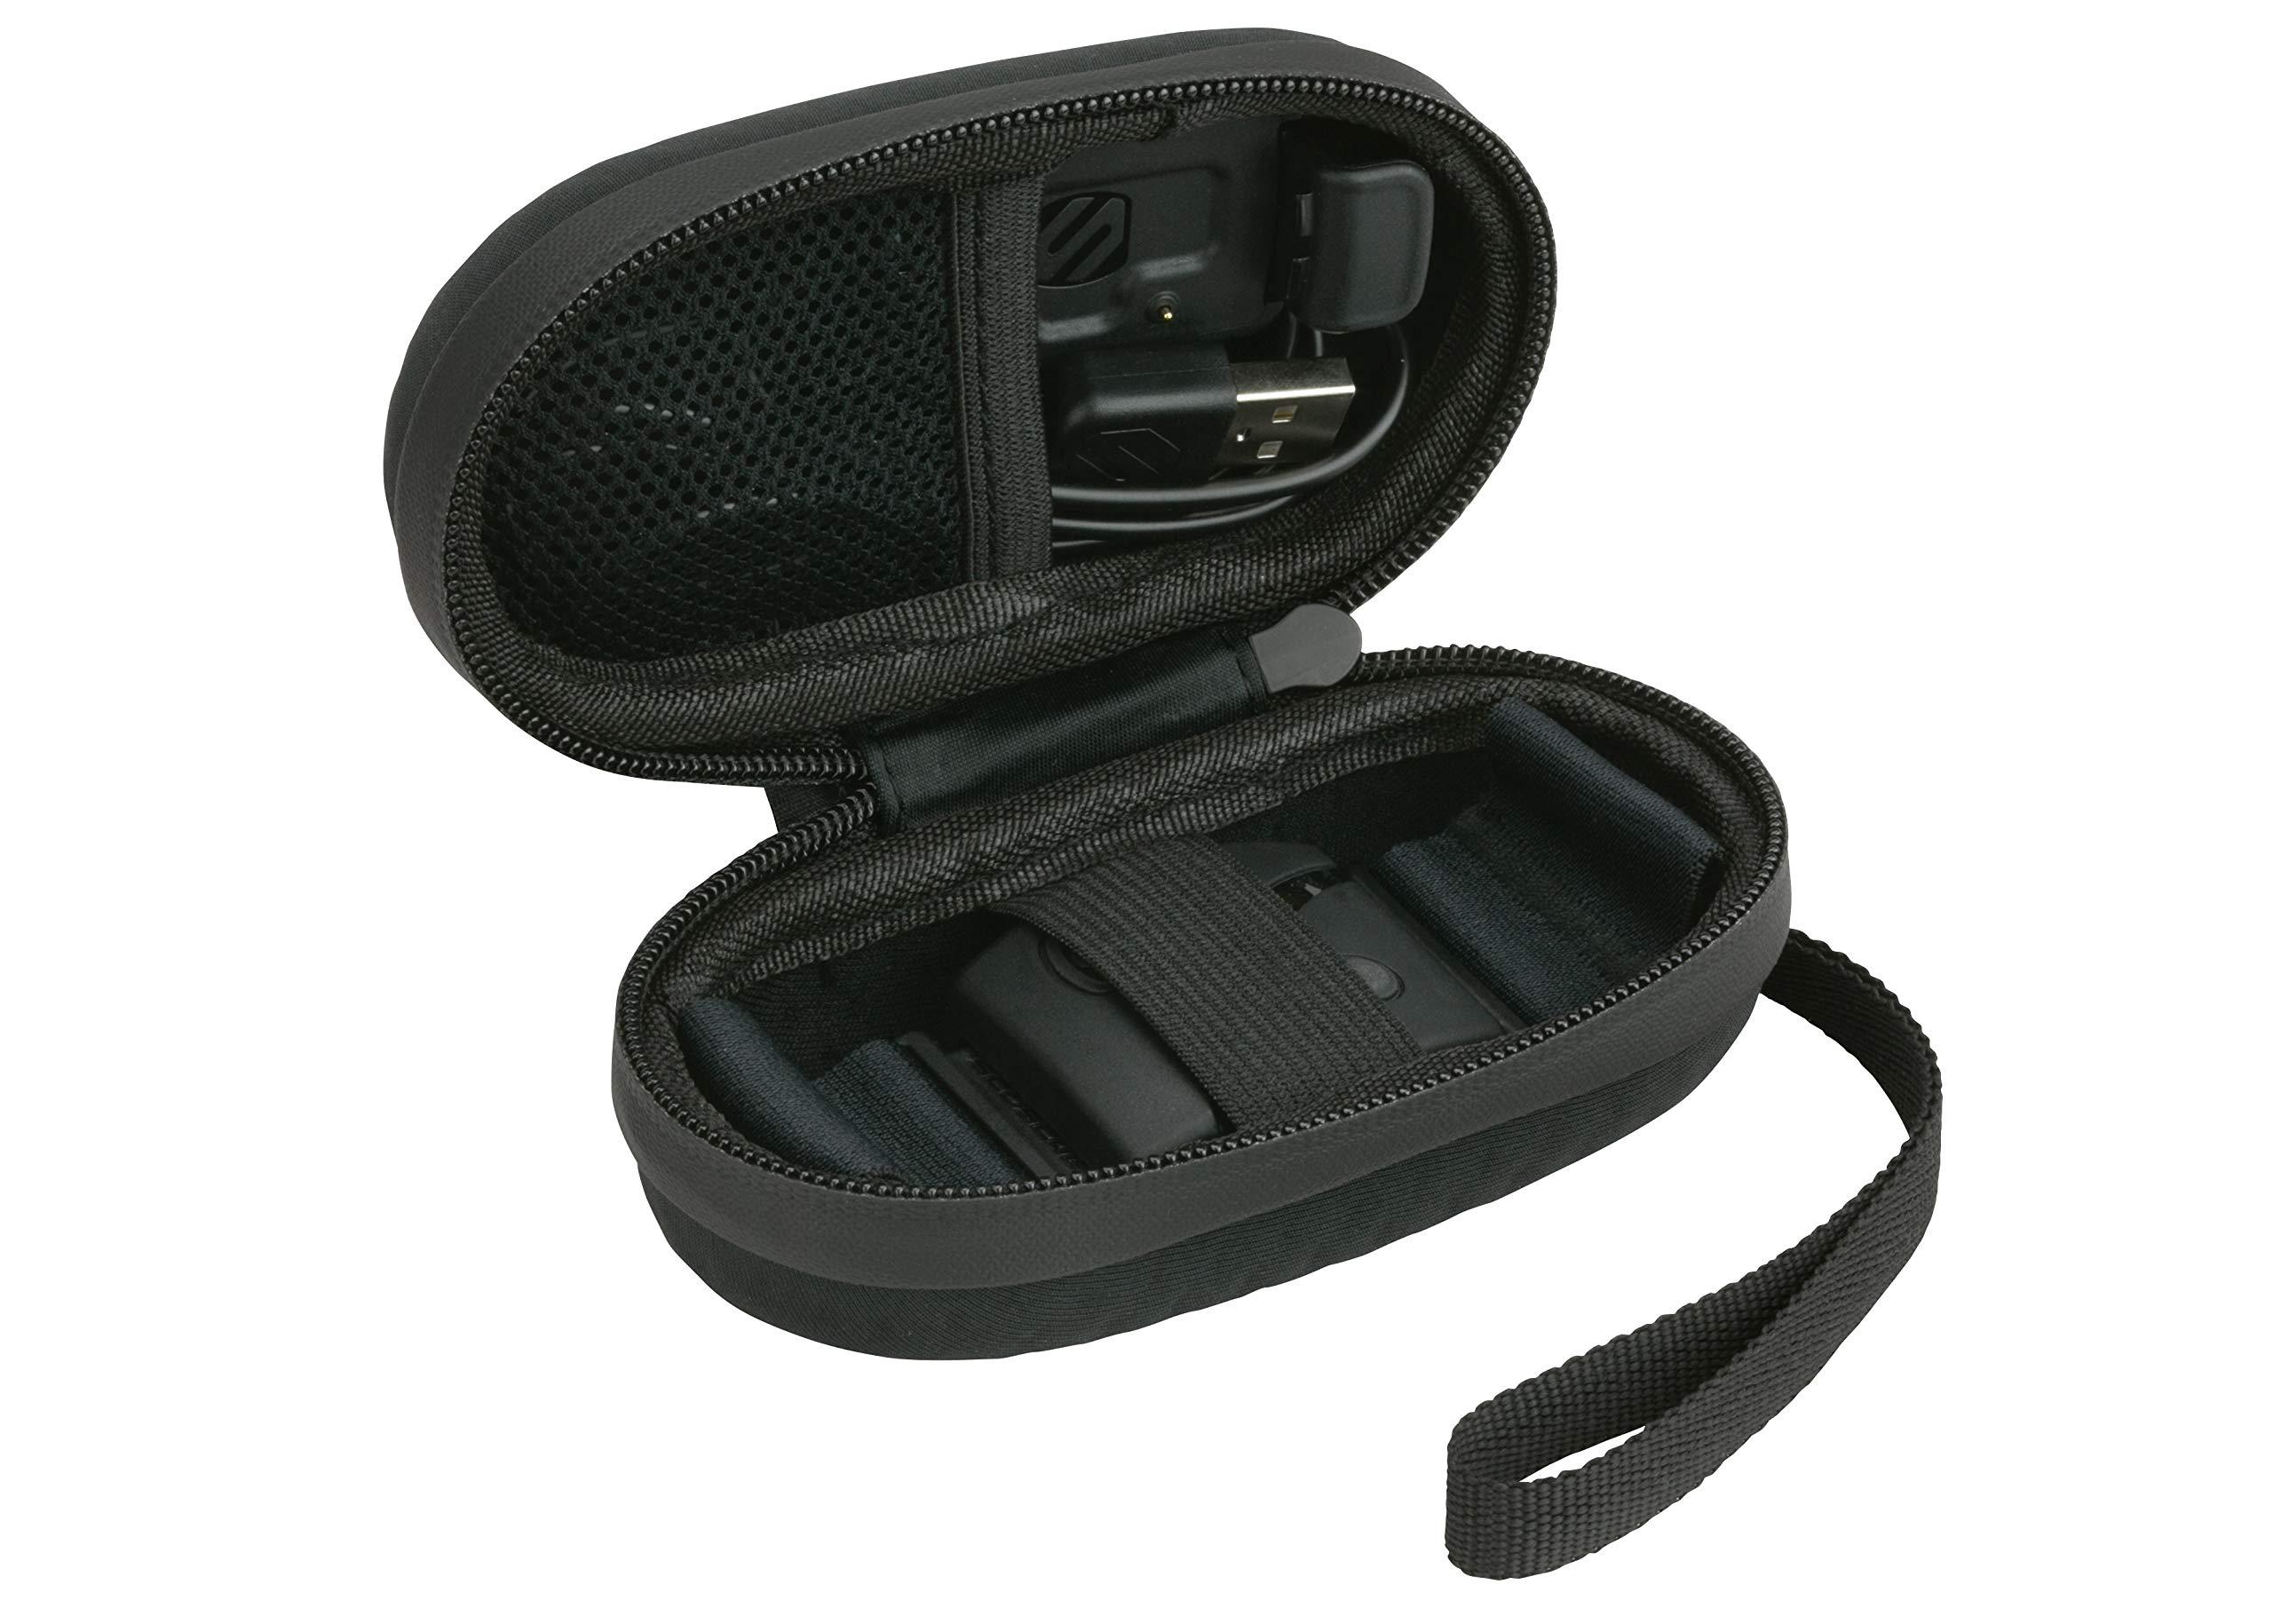 Scosche Rhythm Zipper Case | Hard Case for Rhythm+ and Rhythm 24 (Black) by Scosche (Image #1)